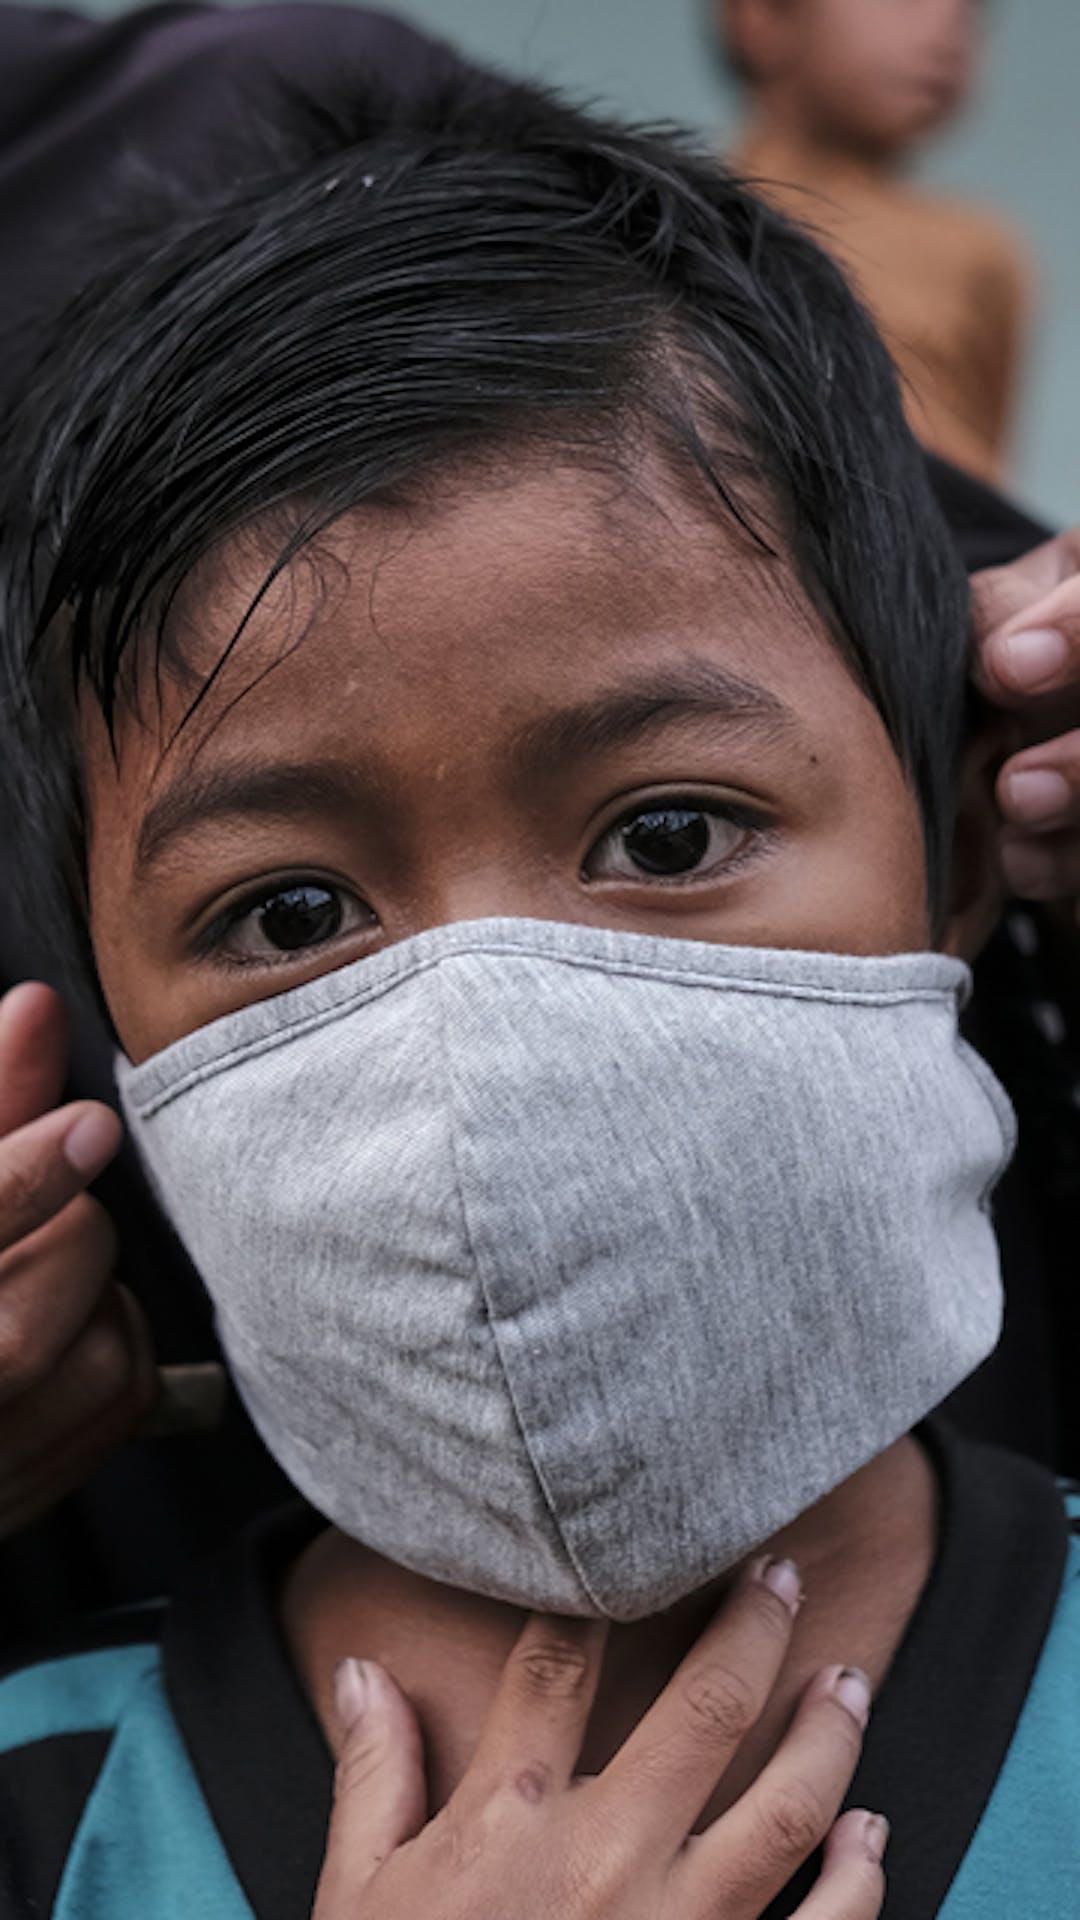 emergenza Covid-19 in Indonesia